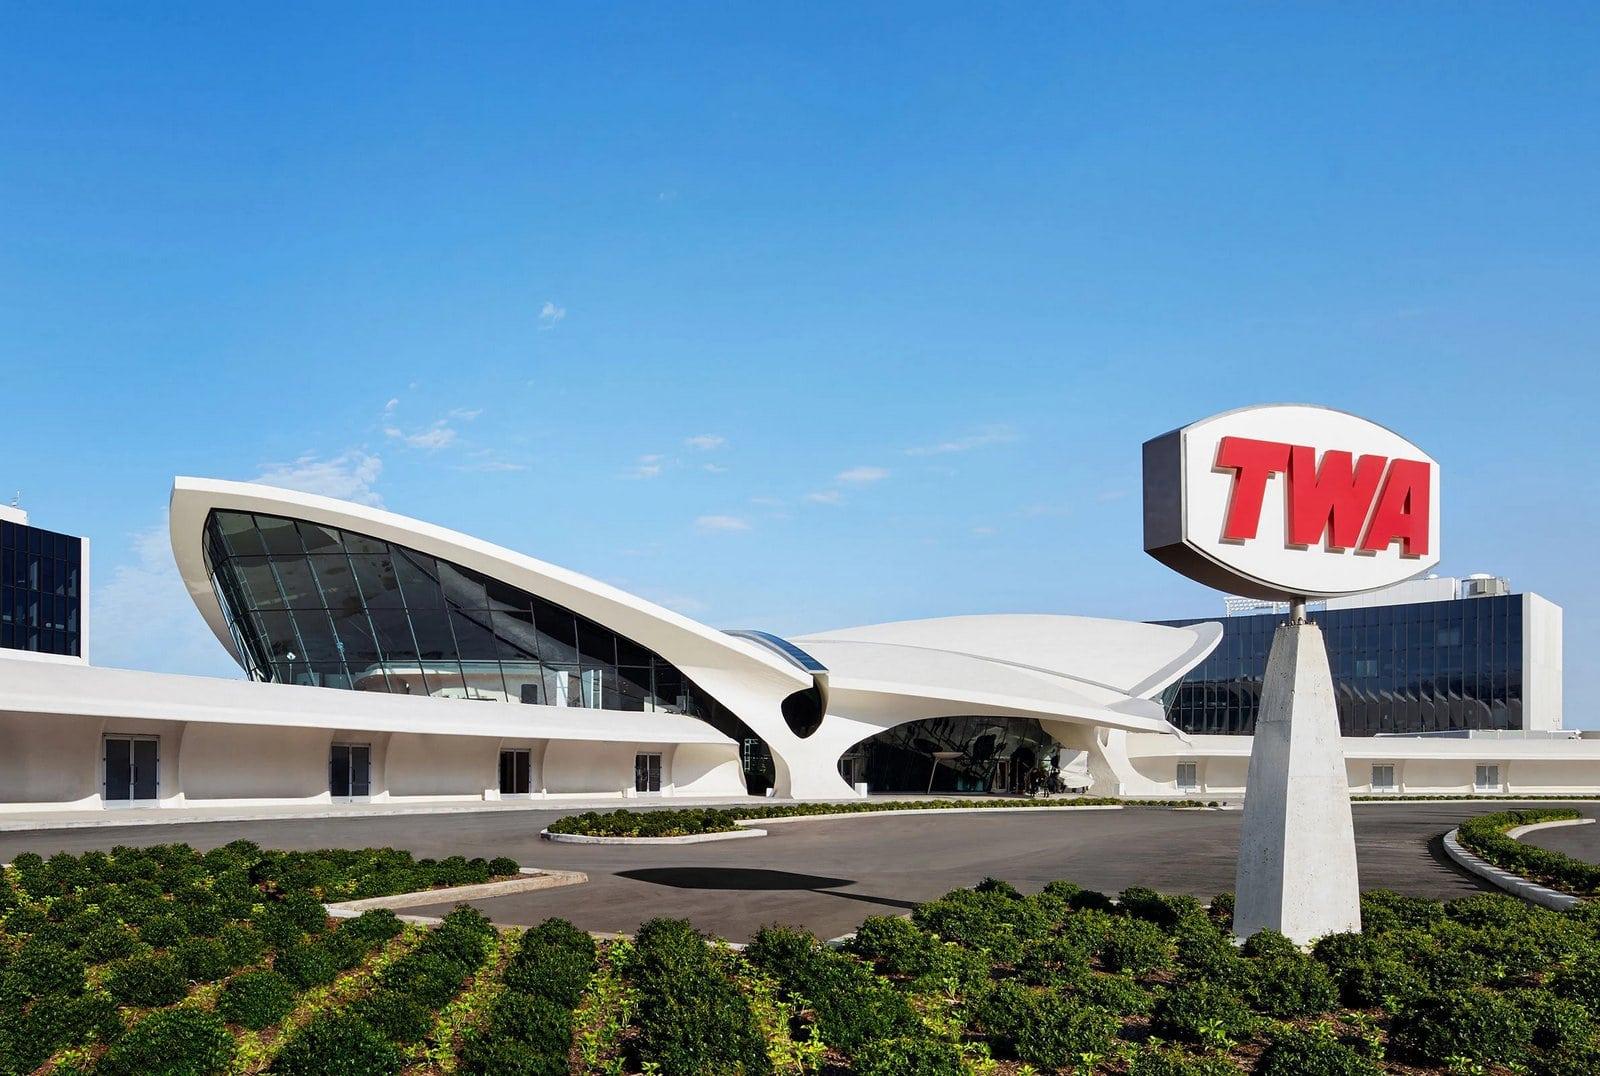 The new TWA Hotel